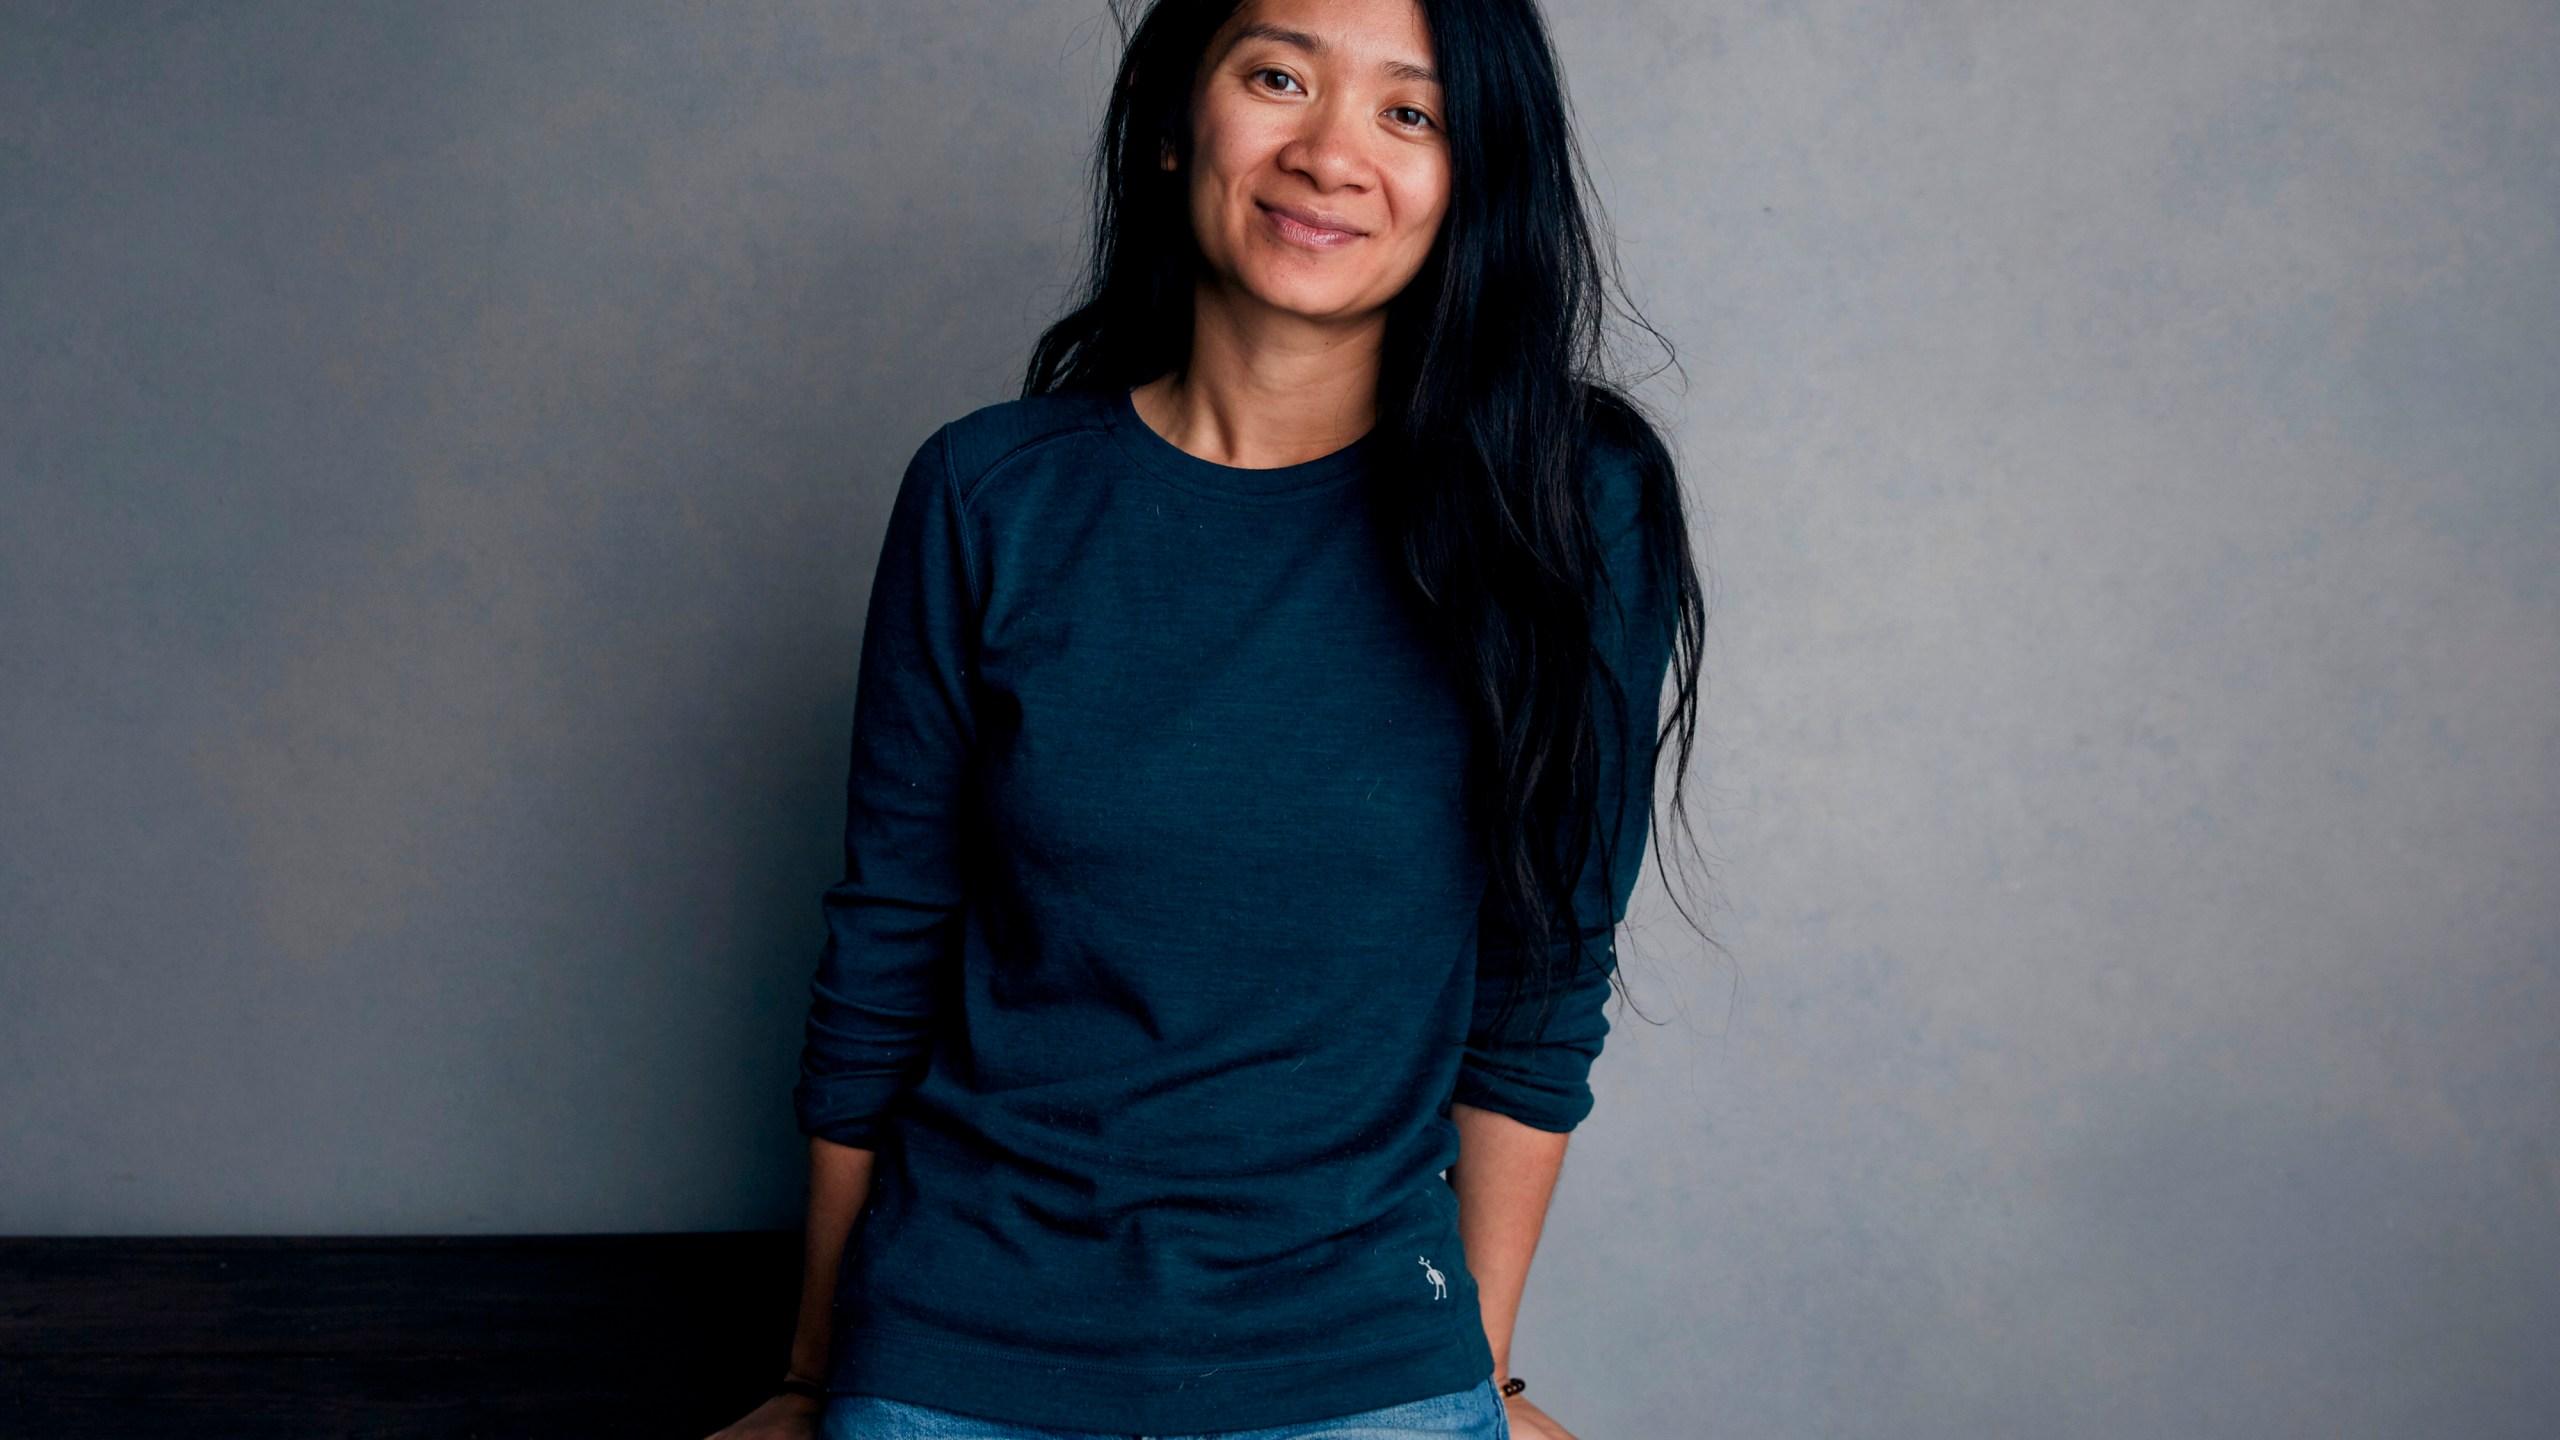 Chloe Zhao